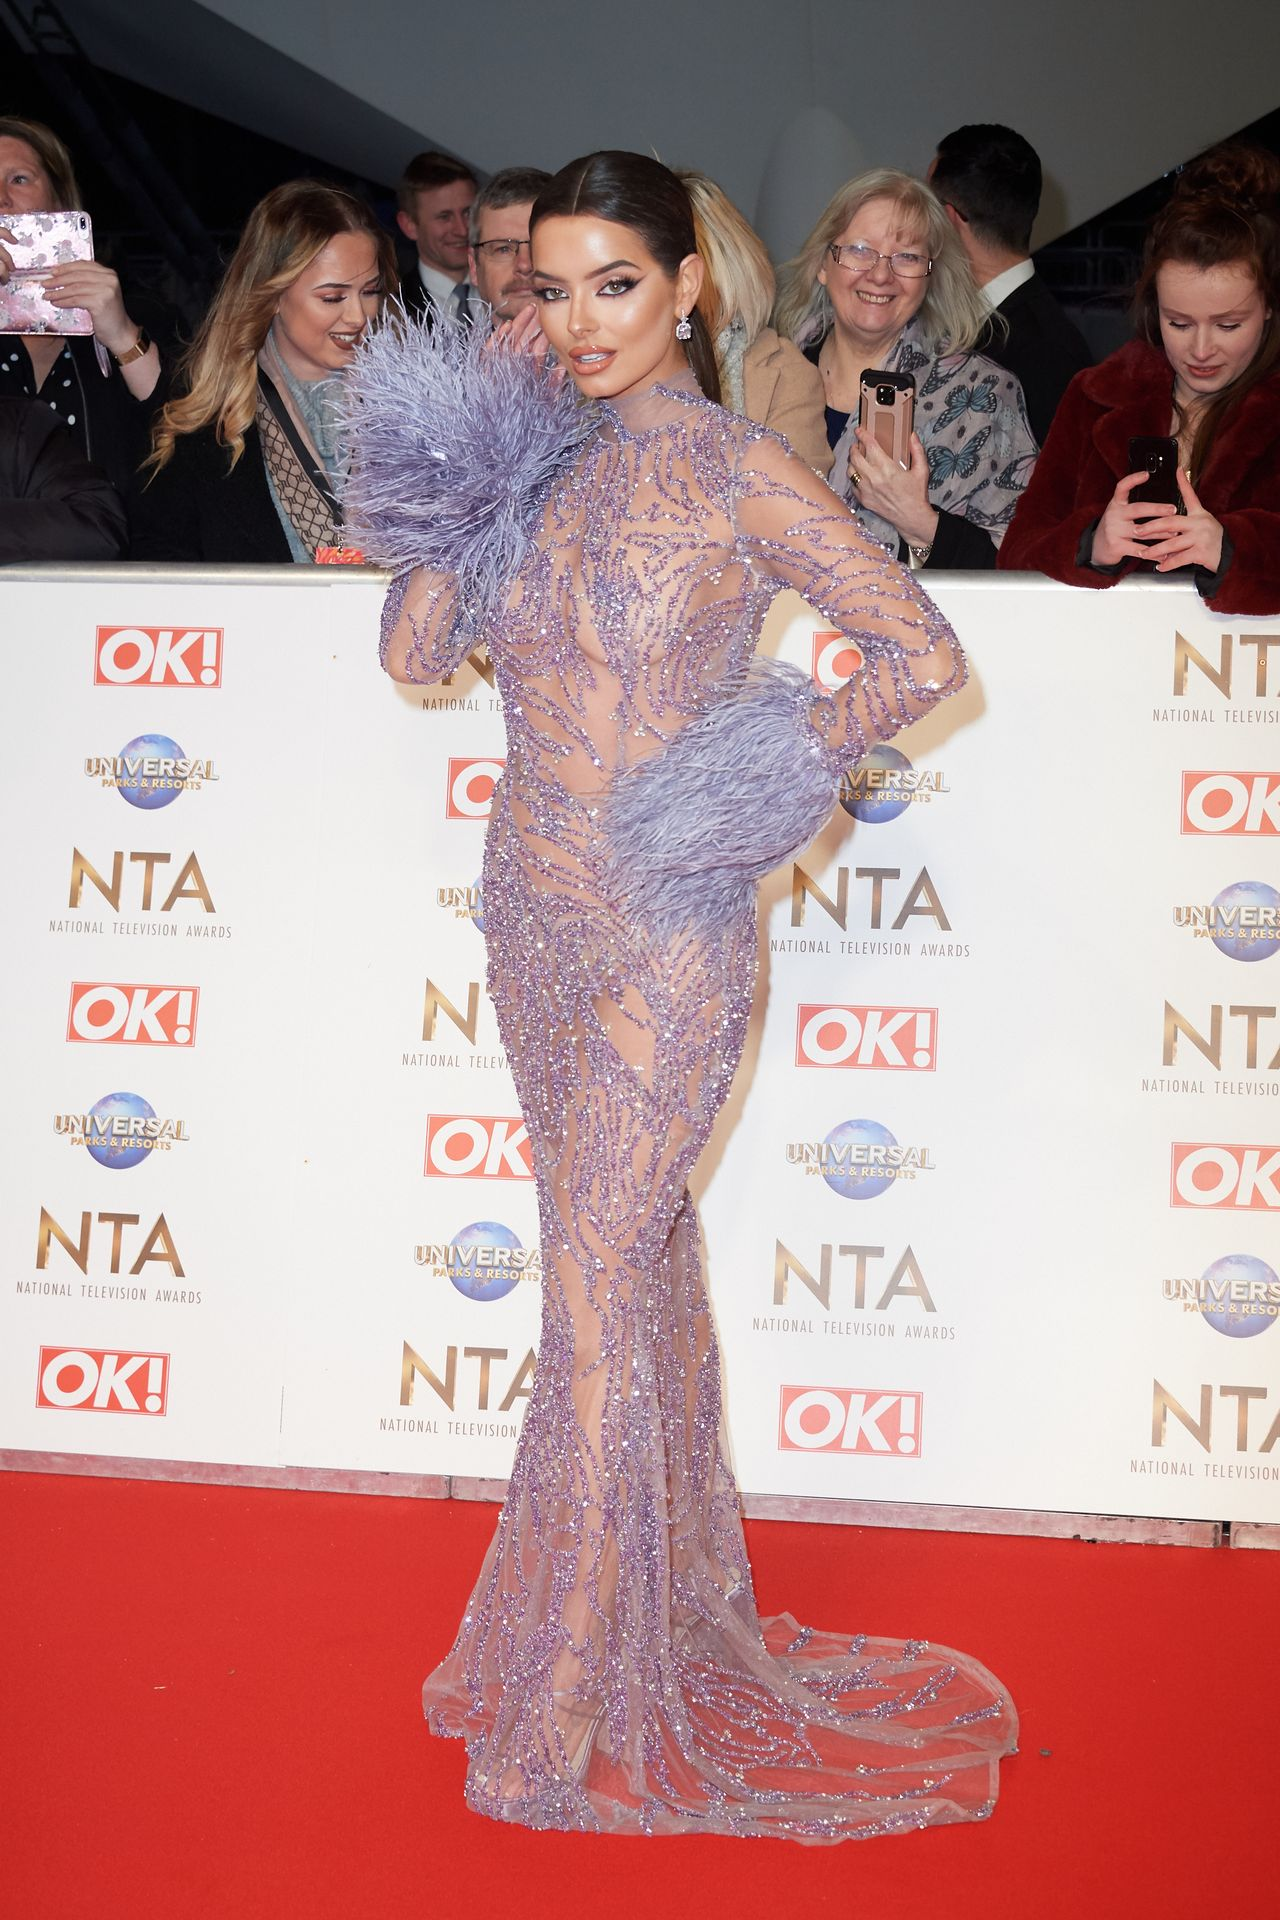 Maura Higgins Looks Hot At The National Television Awards 0007